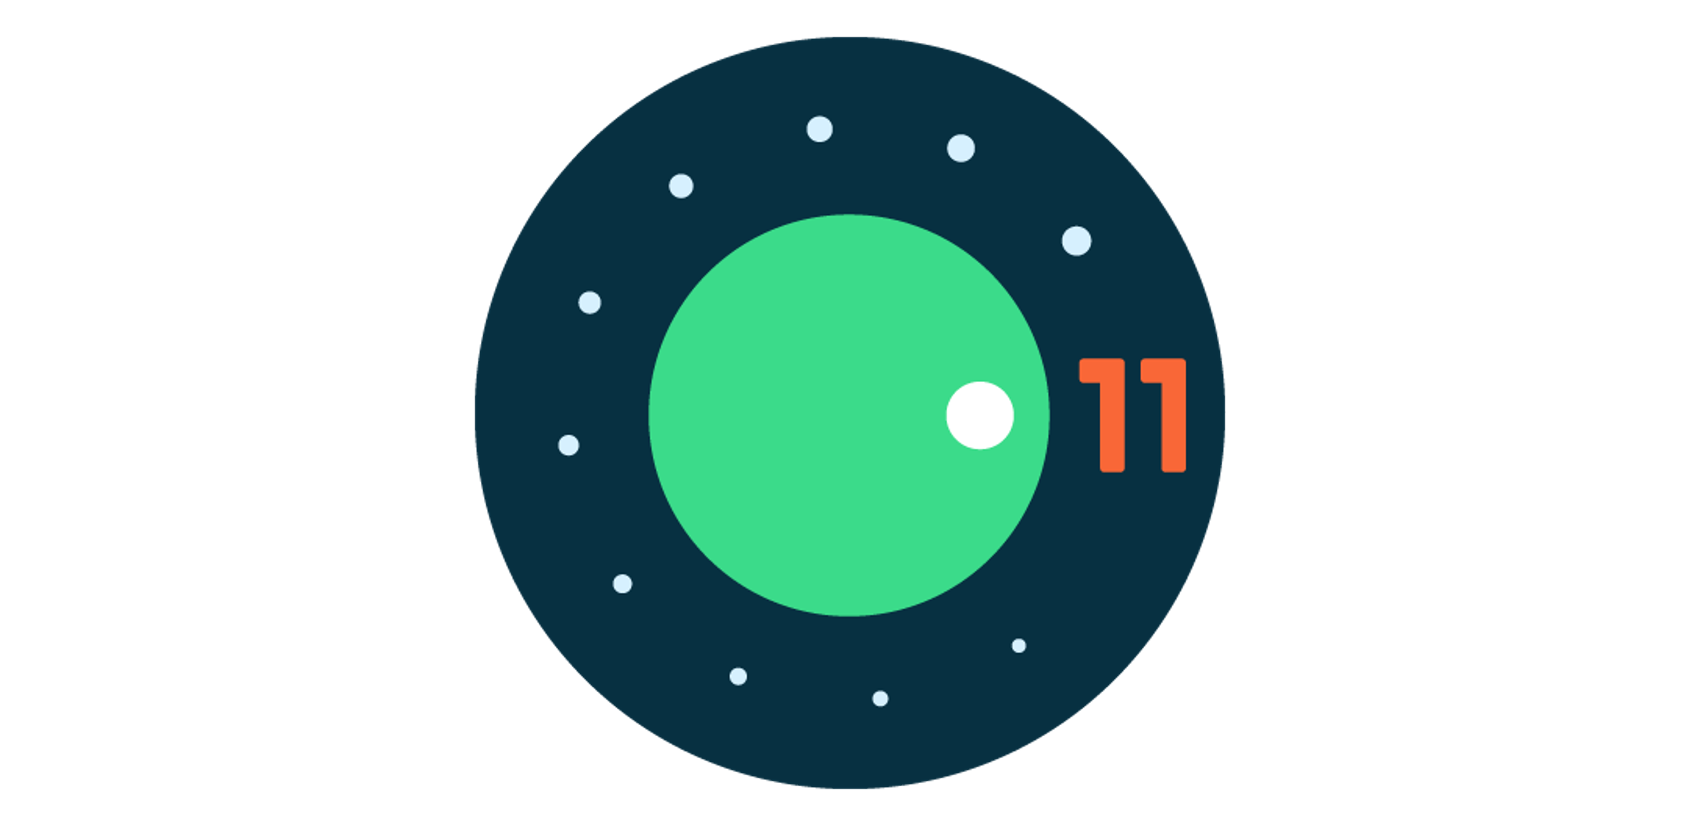 「OnePlus 7T/7T Pro」向けに「Android 11」ベースの「OxygenOS OpenBeta 1」がリリース